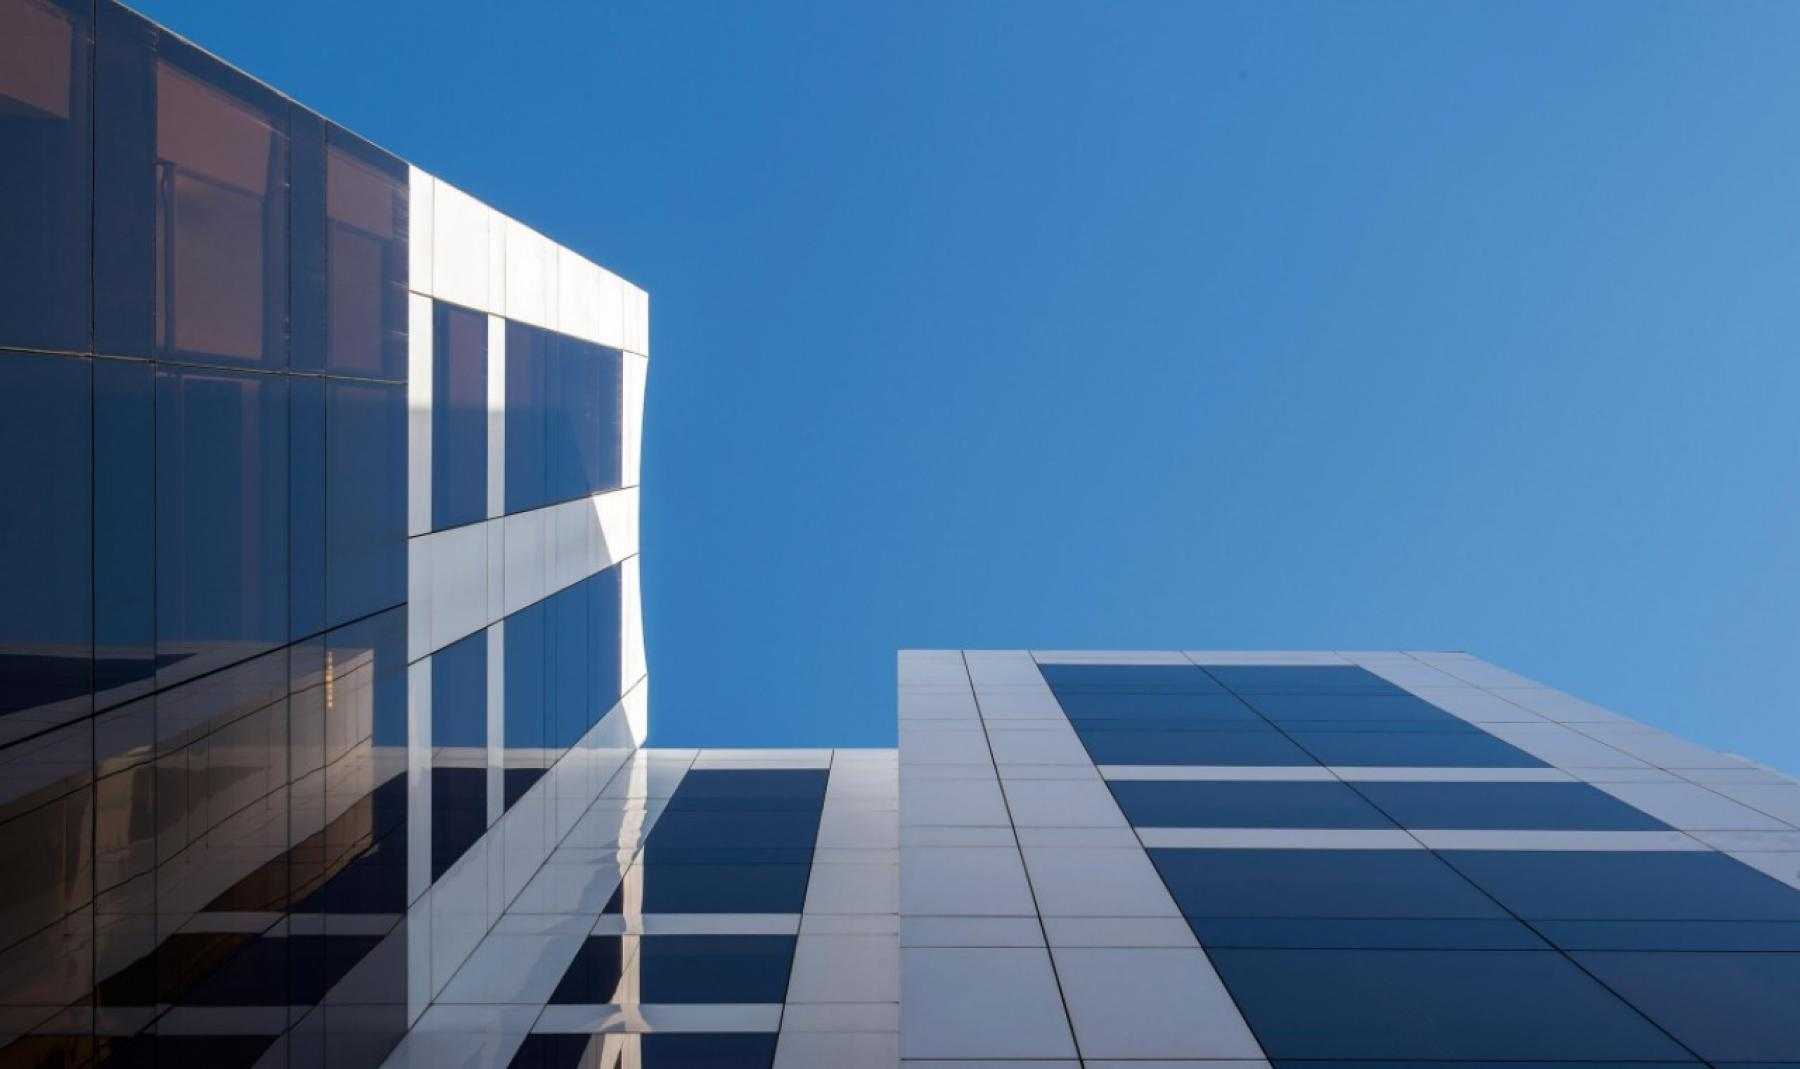 Alquilar oficinas Diagonal , Barcelona (6)